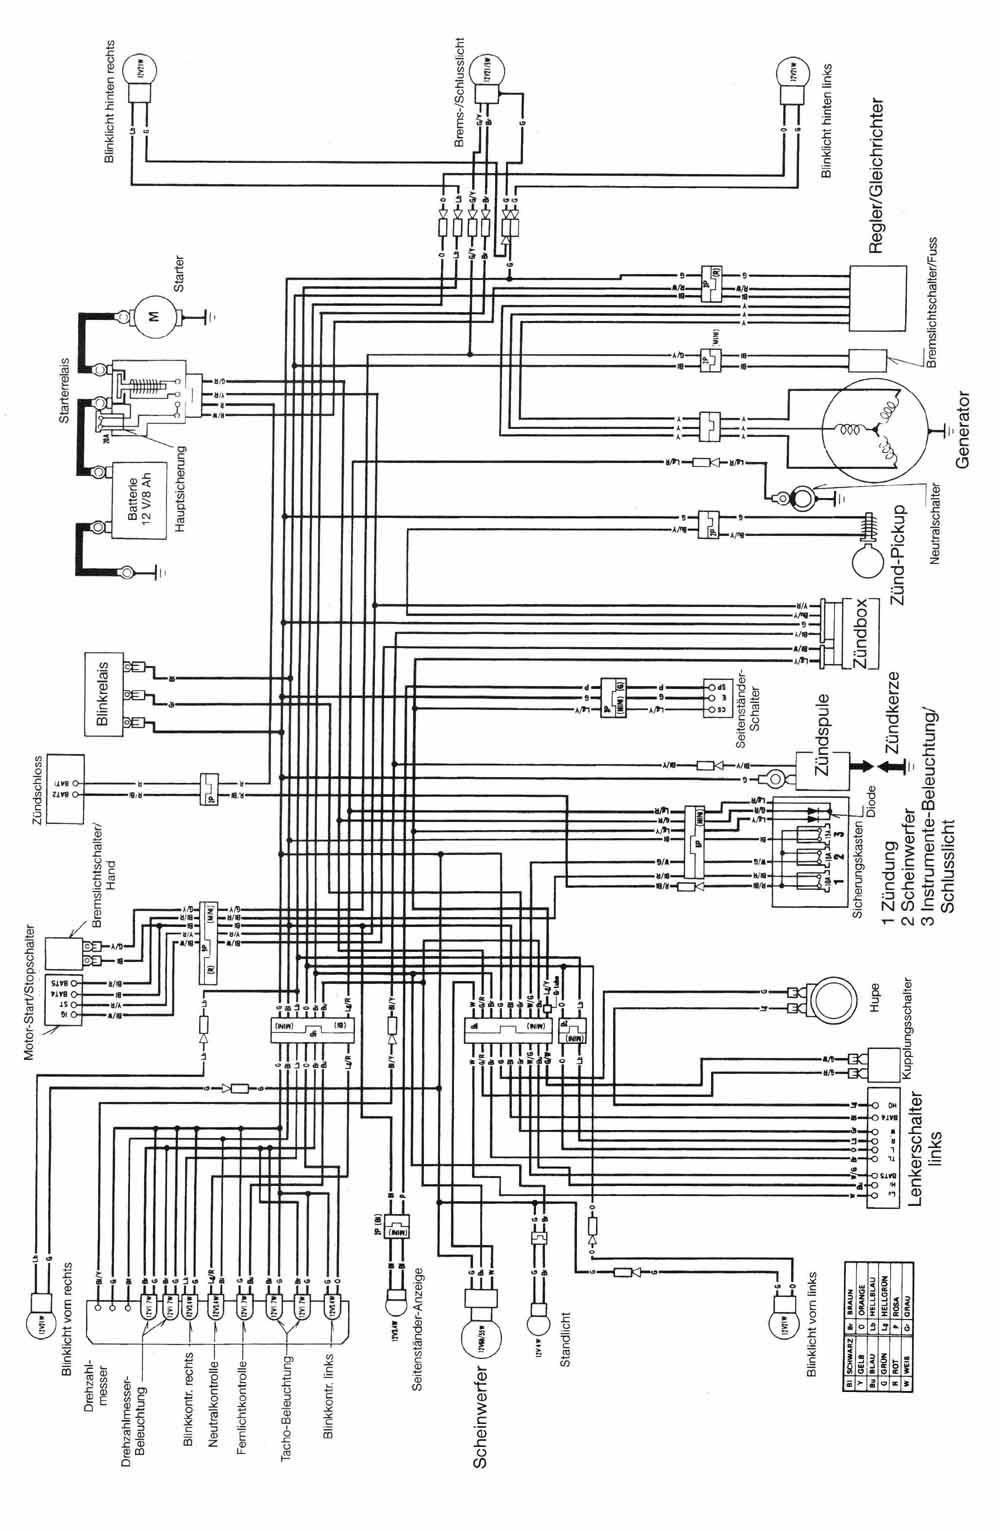 medium resolution of honda dominator wiring diagram wiring diagram third level verucci wiring diagram honda dominator wiring diagram